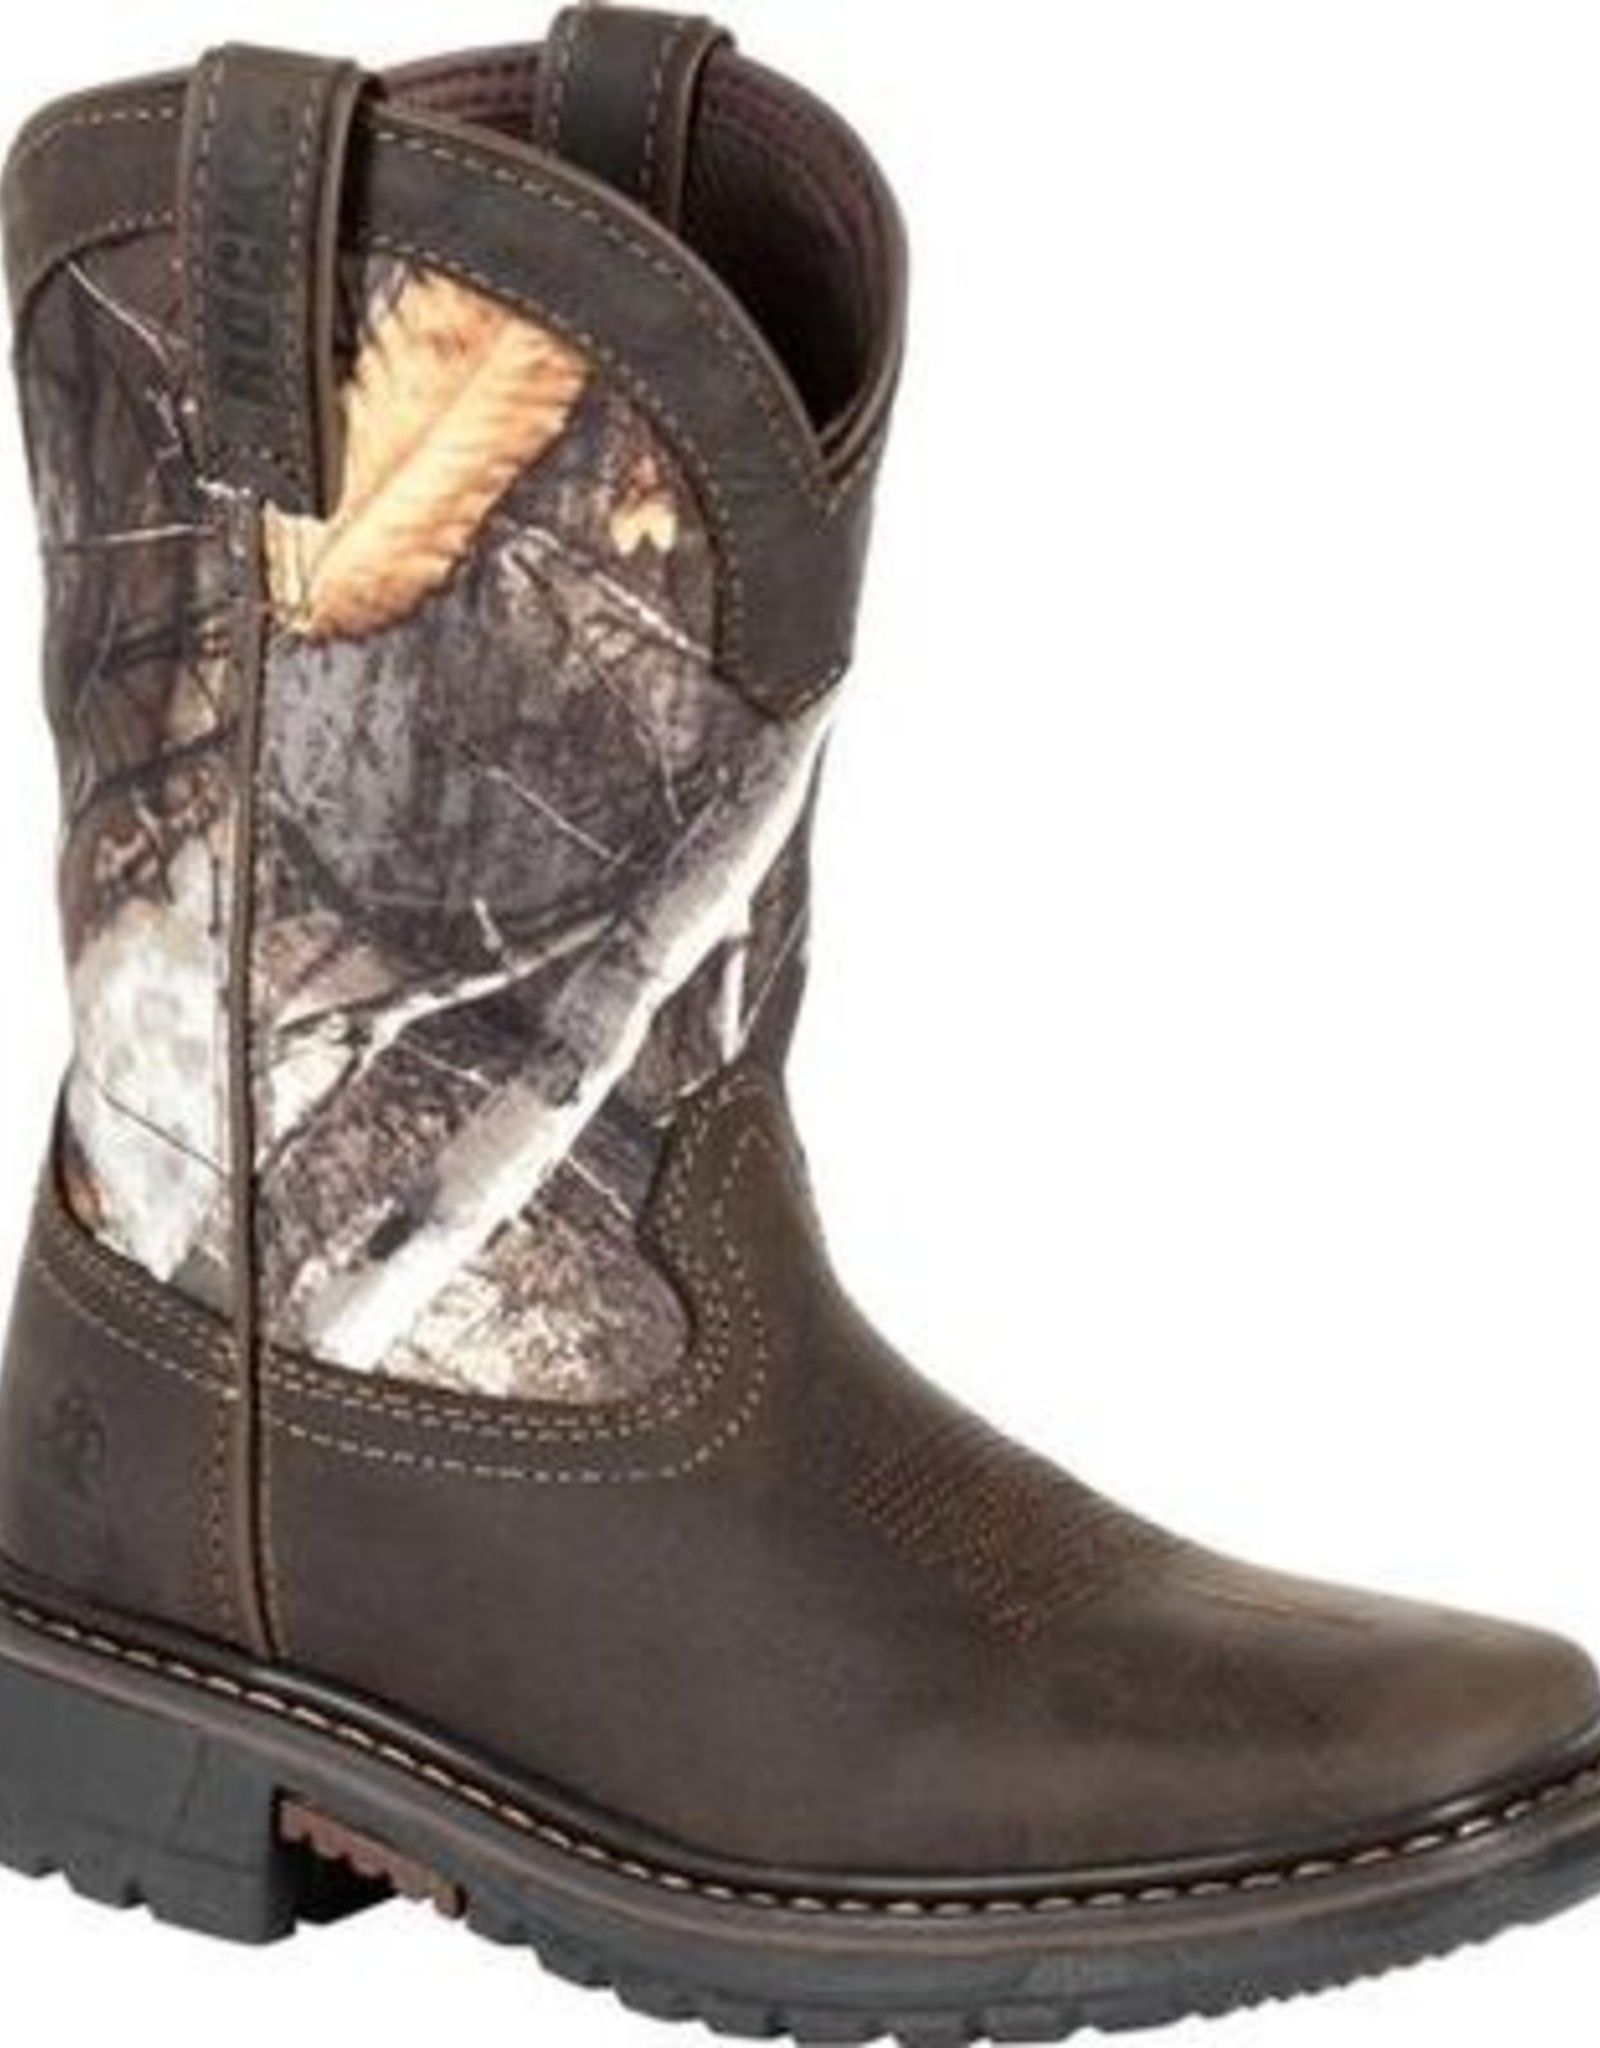 "Rocky Brands Boots Kids Brn 8"" Waterproof Western Real Tree Camo Boots"